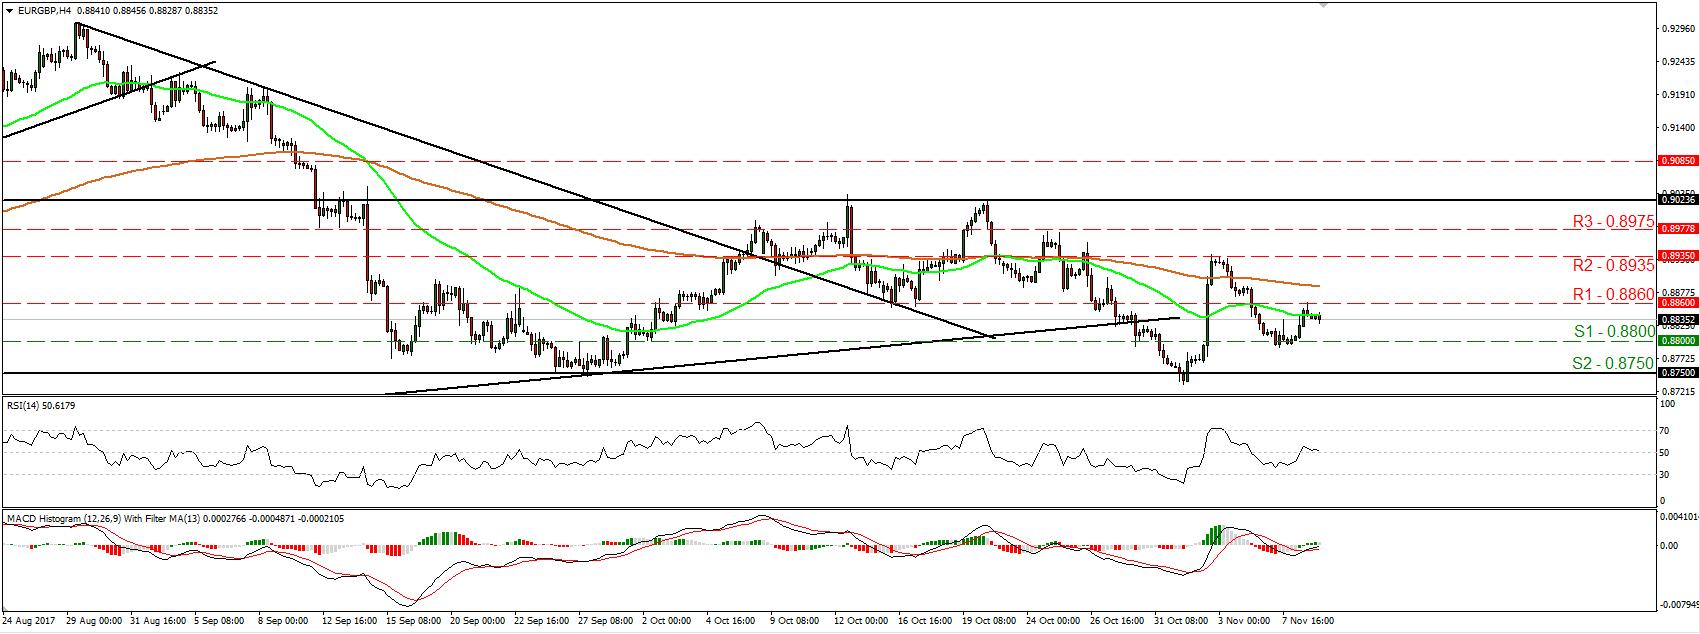 EUR/GBP 09 Nov 2017 | Econ Alerts